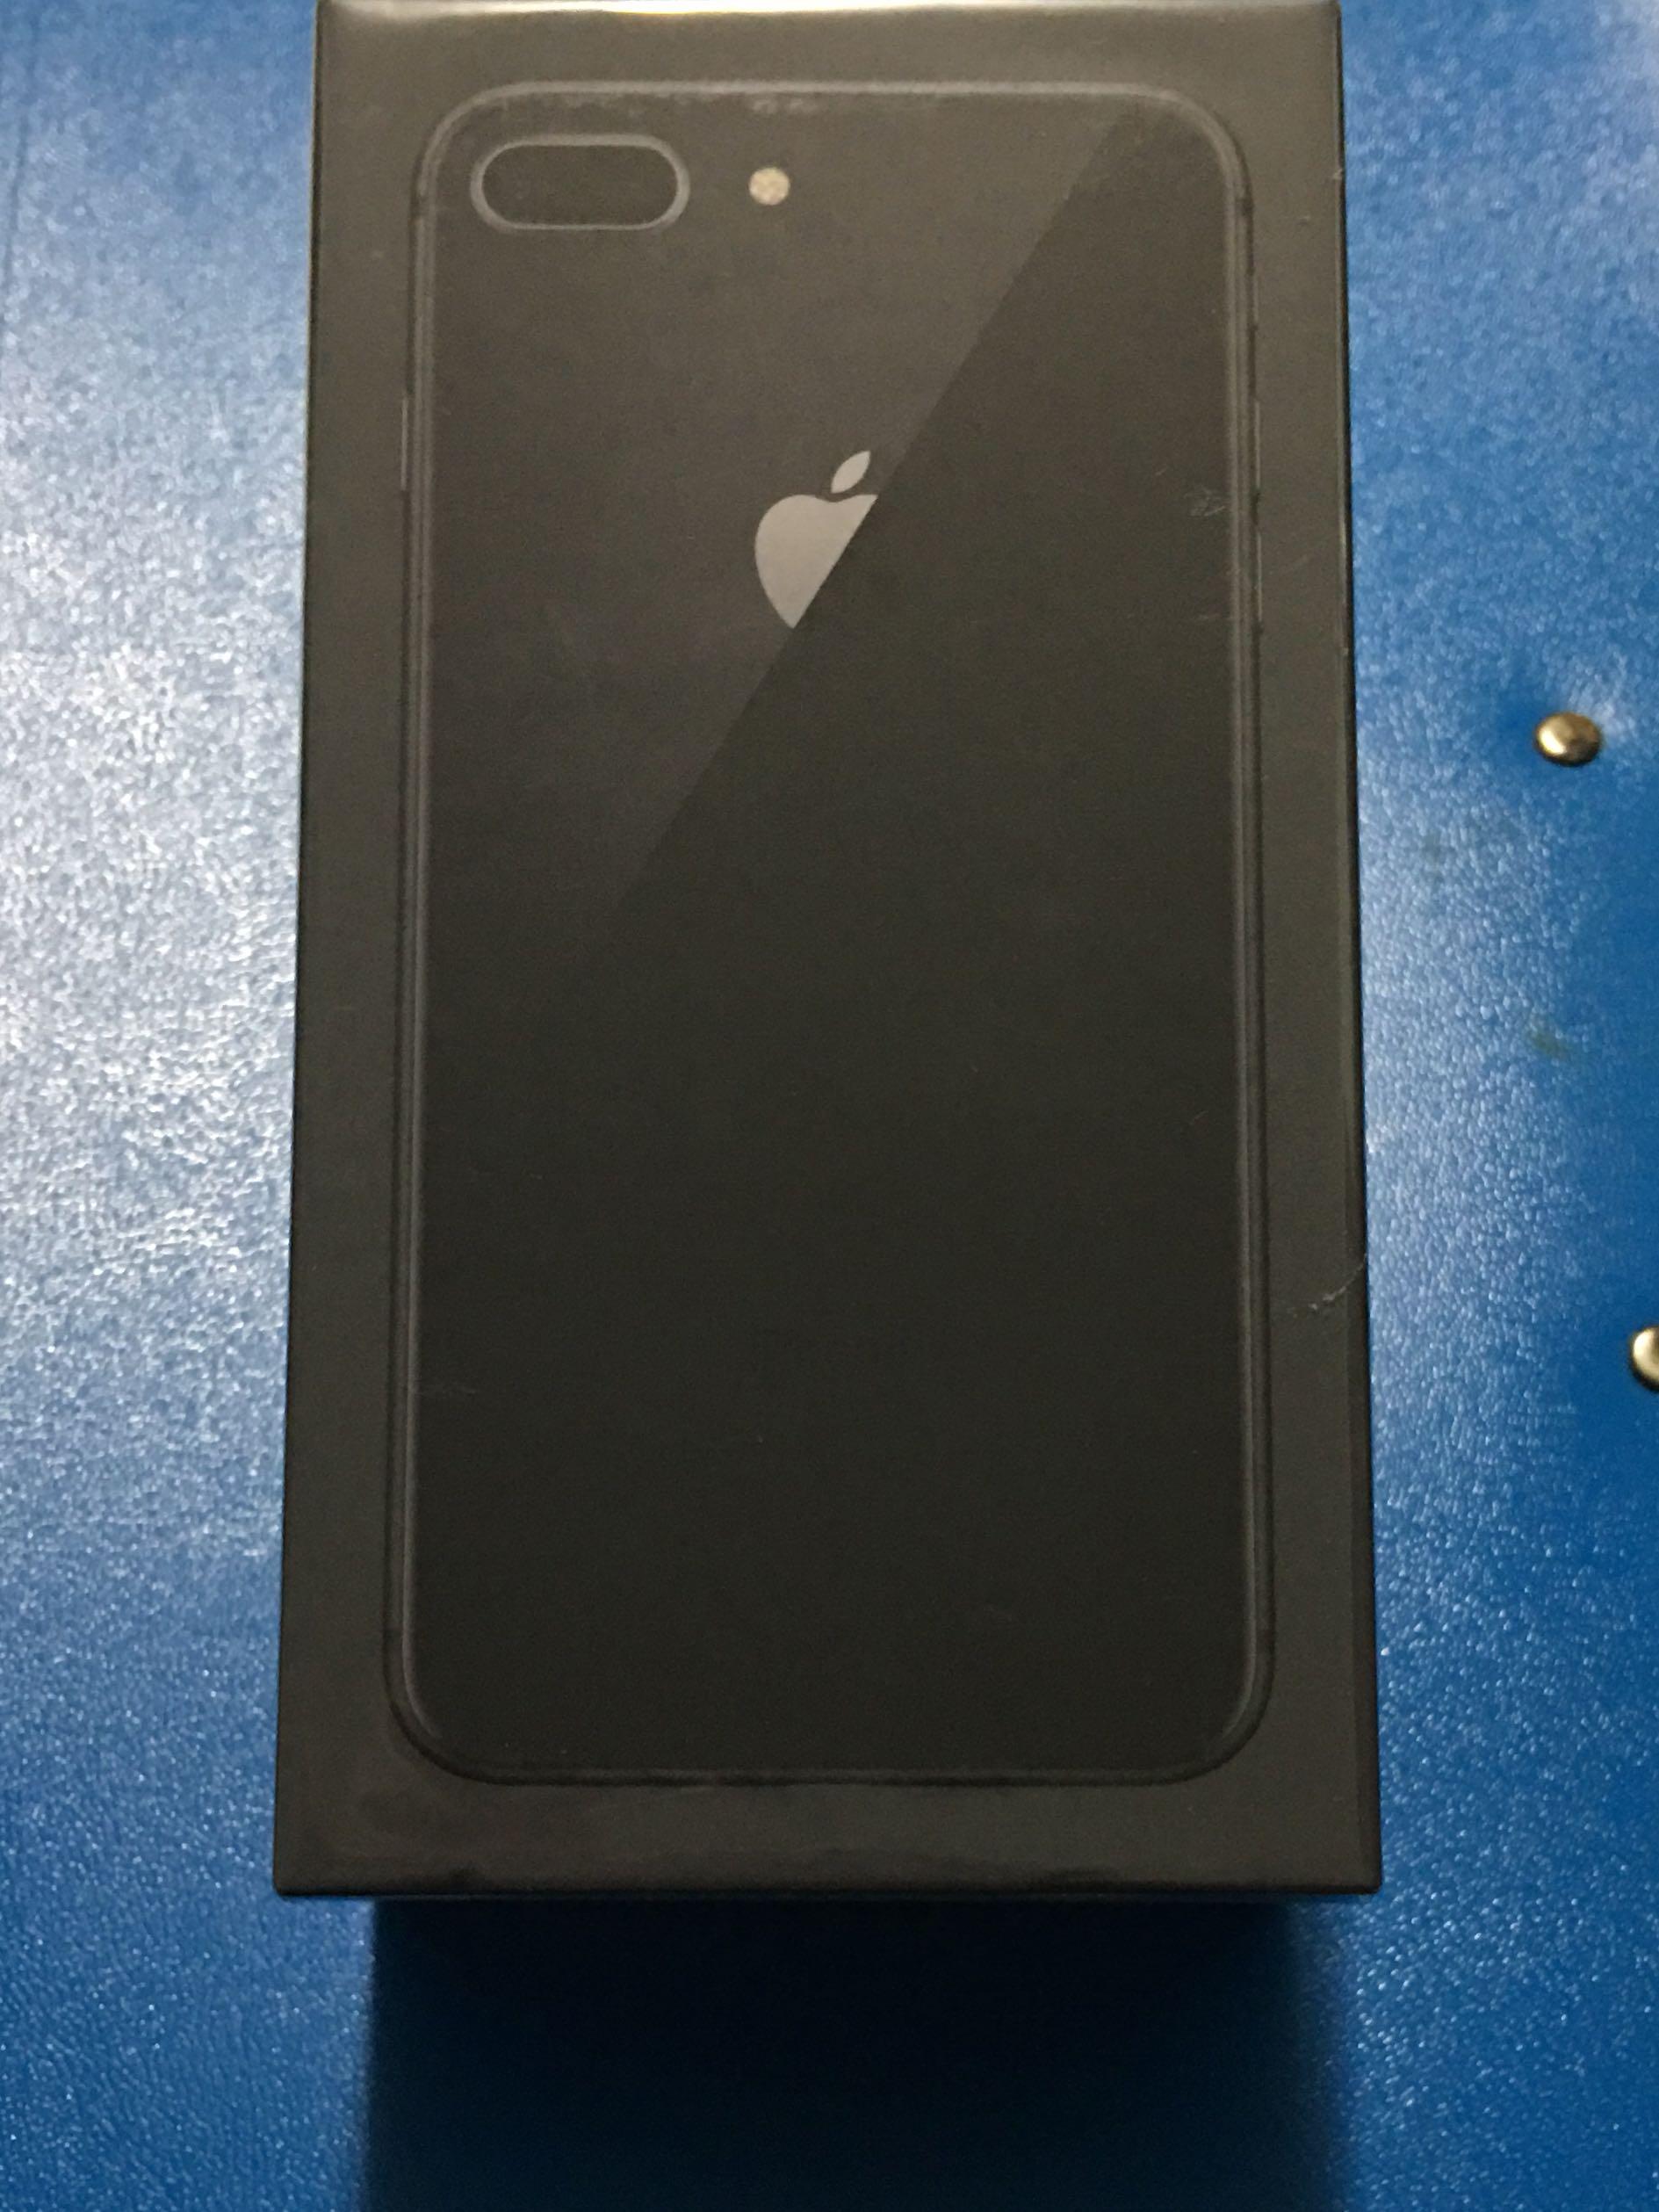 0db3ff7b89d Iphone 8 plus 256gb space grey